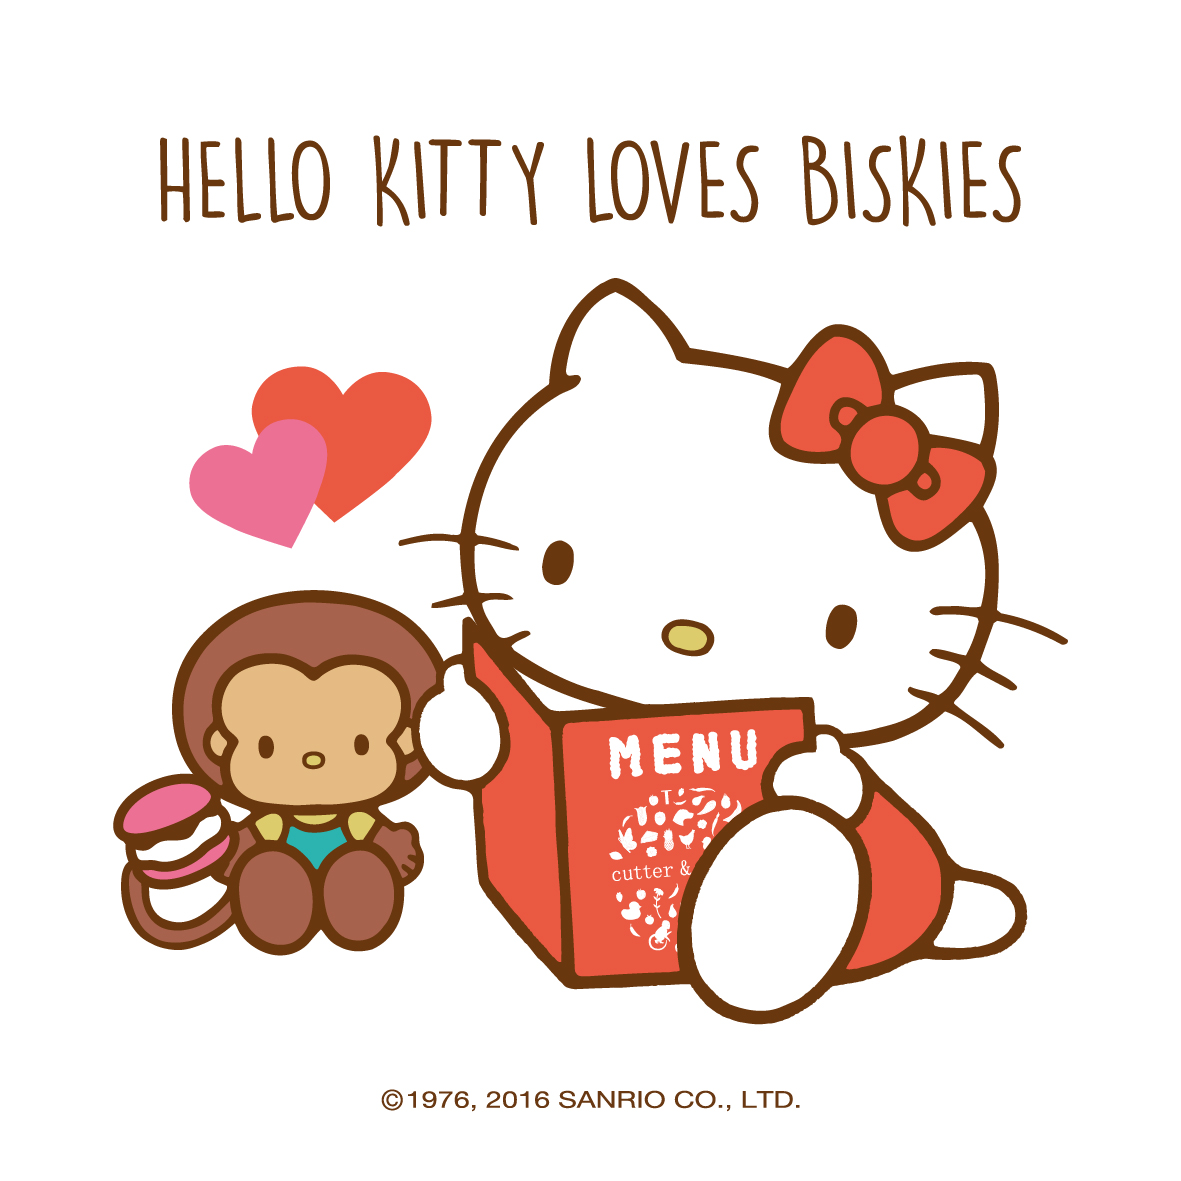 Hello Kitty Kitchen Cafe Manual: Enjoy Your Afternoon Tea In Hello Kitty Paradise London